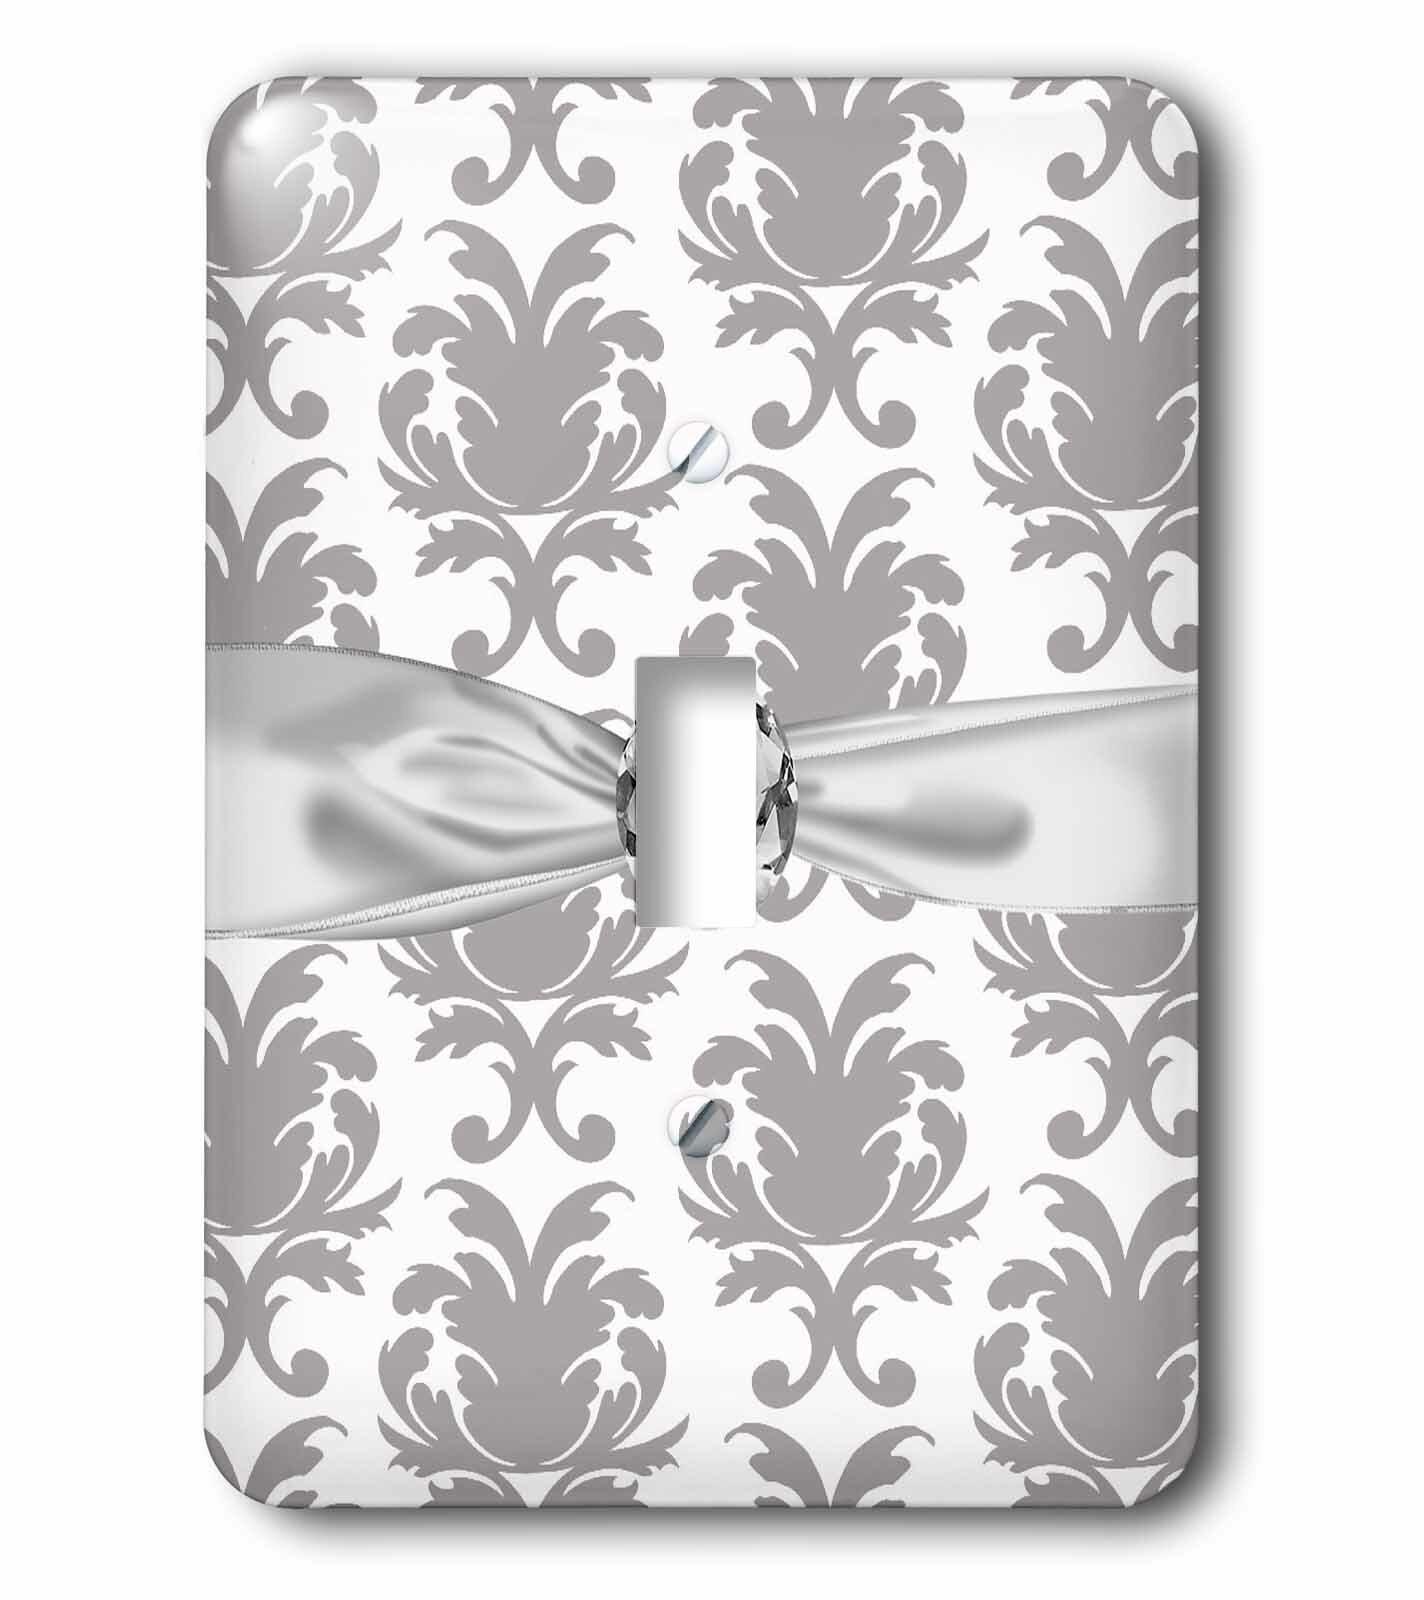 3drose Baroque Decorative Elegant Damask Faux Diamond Ribbon 1 Gang Toggle Light Switch Wall Plate Wayfair